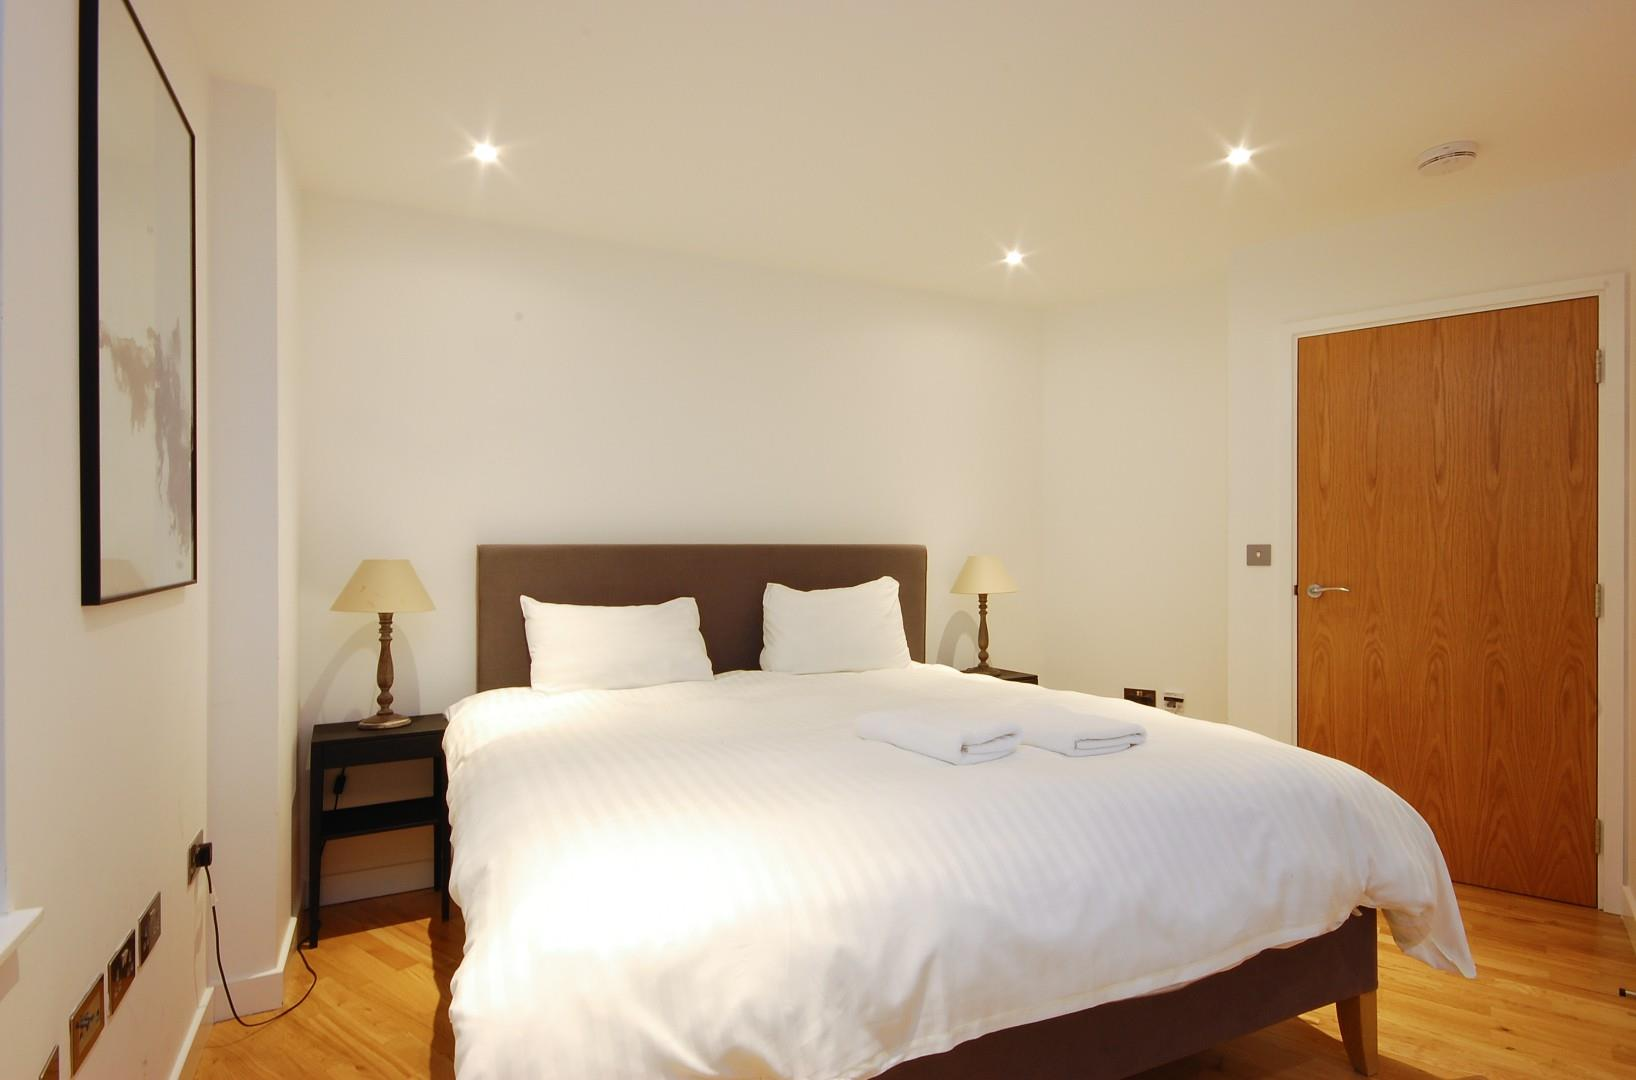 Godfrey-Bedroom 4b.jpg